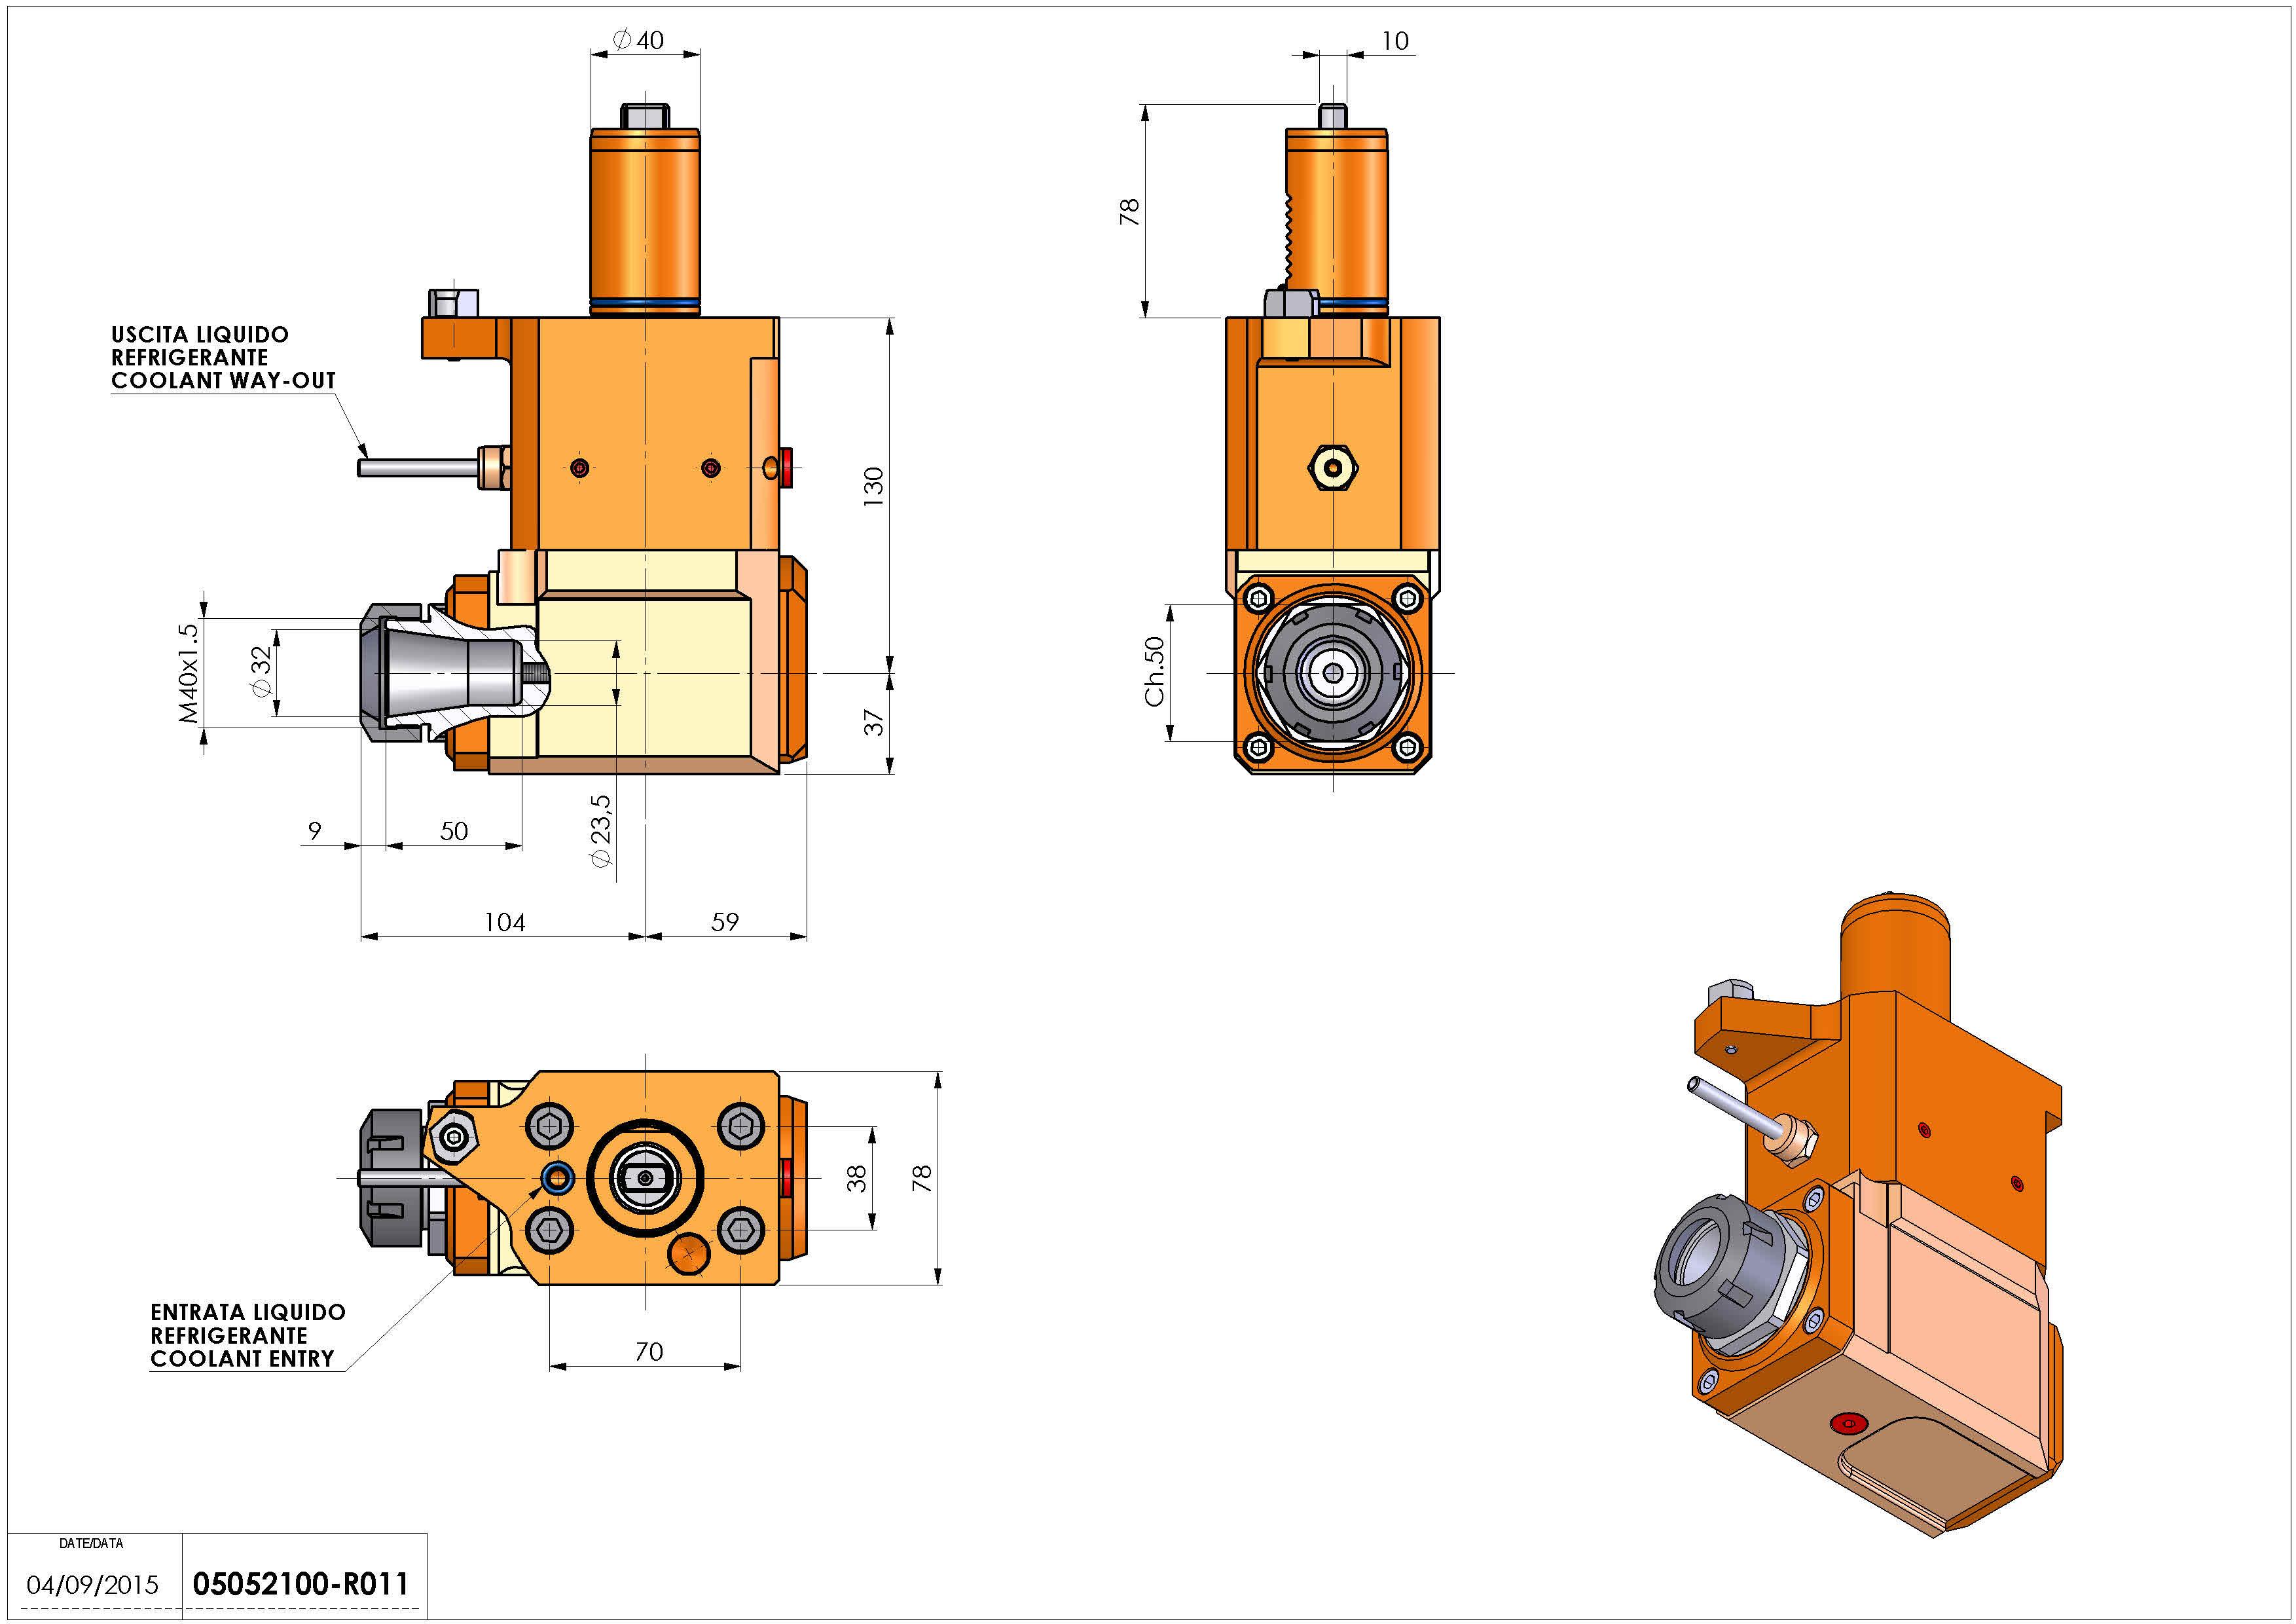 Technical image - LT-A VDI40 ER32 LR H130 MLP MZ.